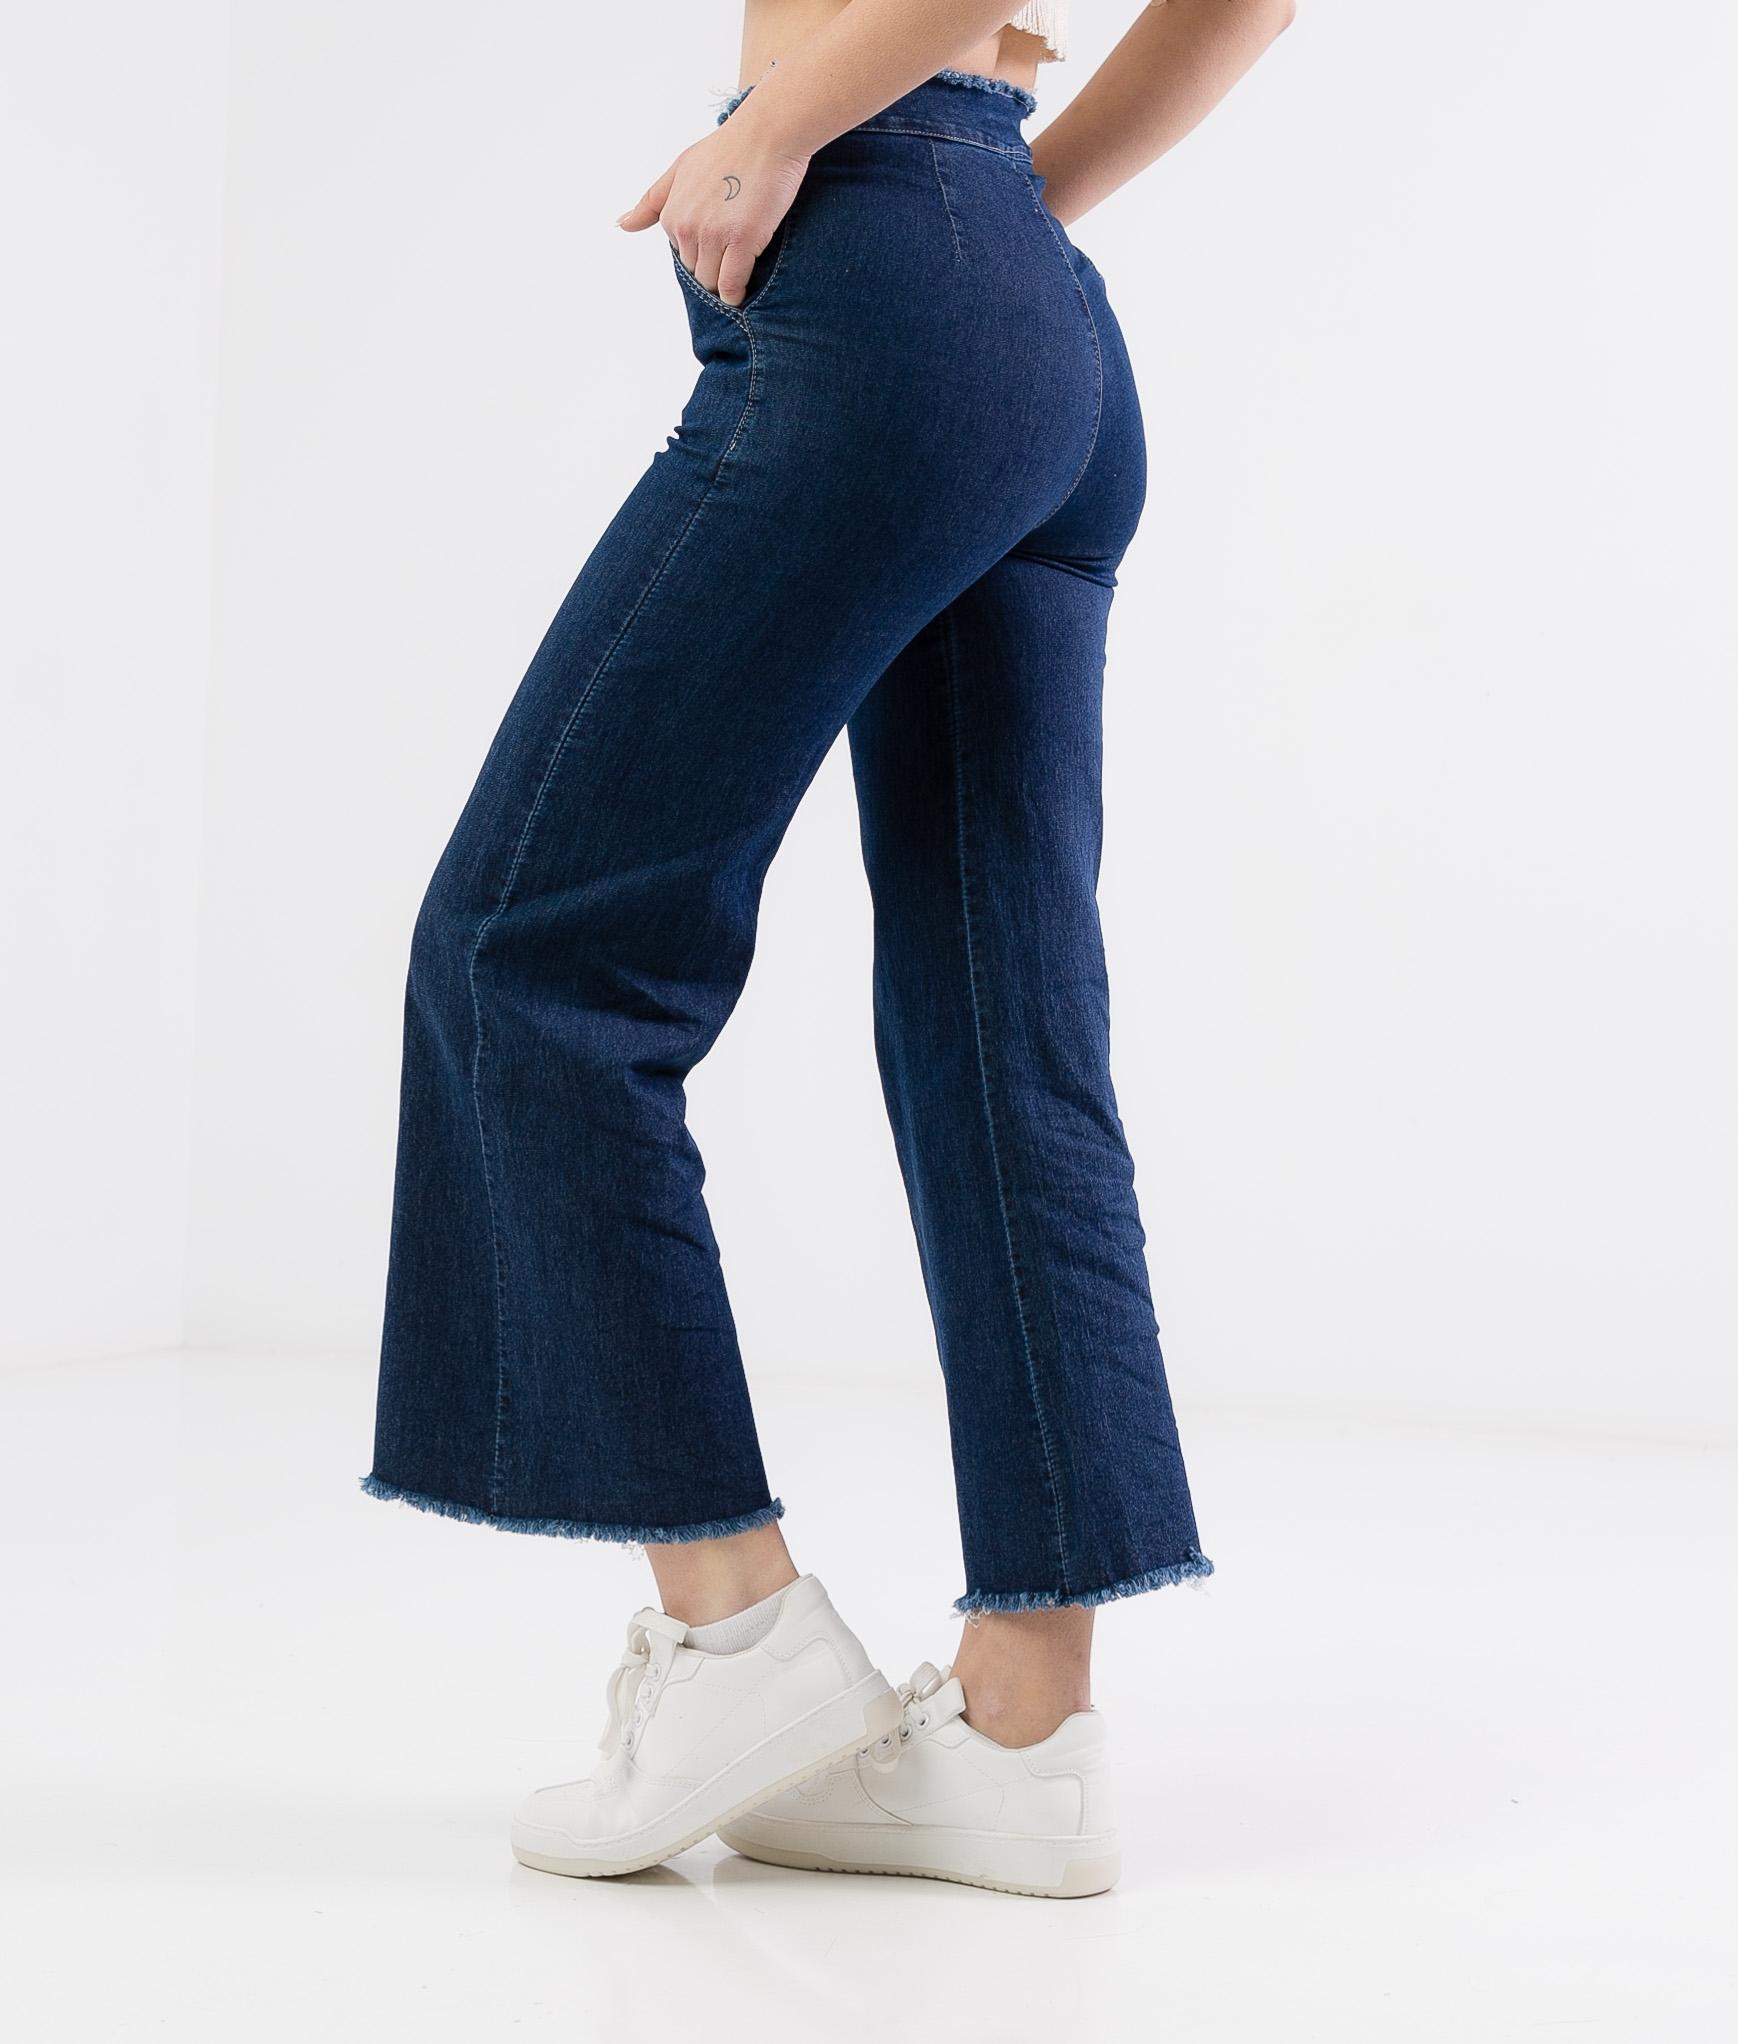 Pantalon Lumbus - Denim foncé